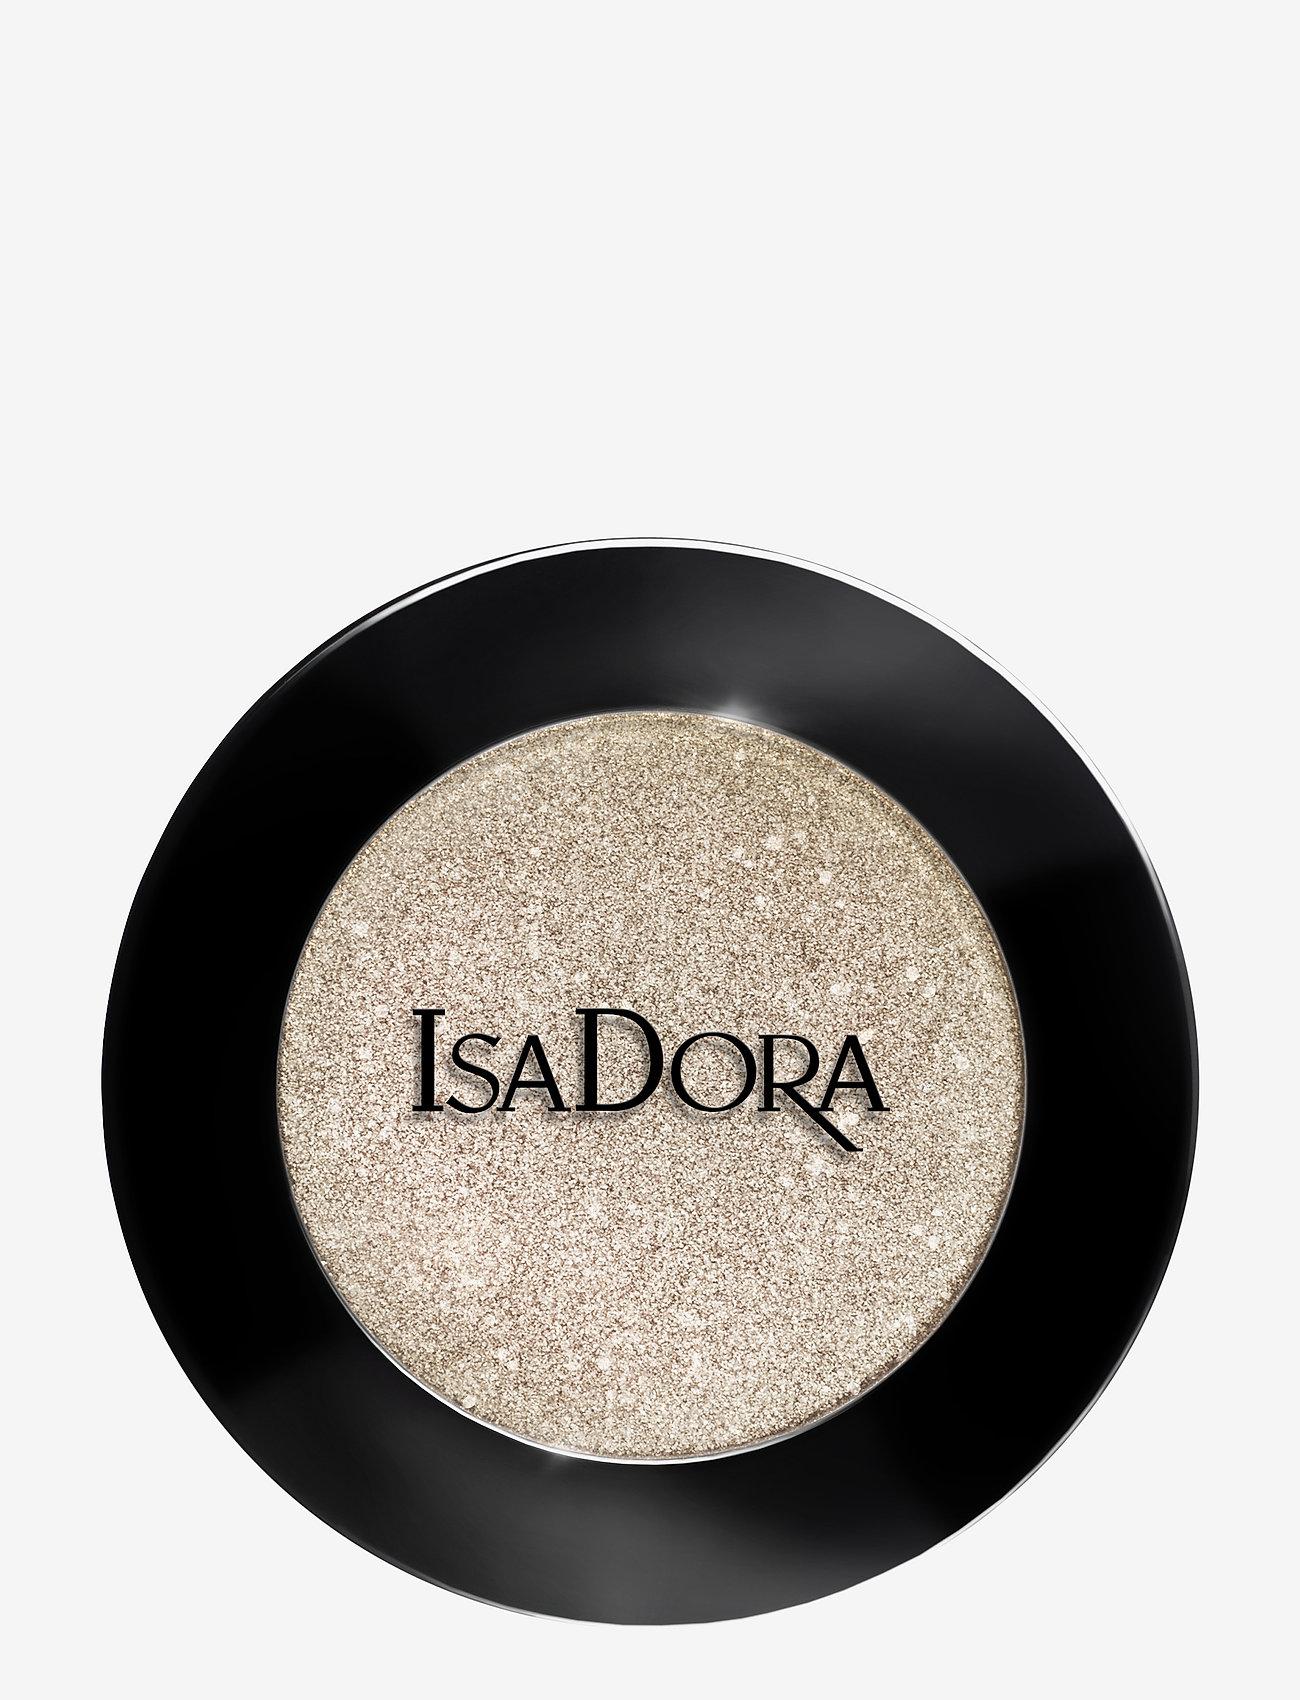 Isadora - PERFECT EYES 20 GLOSSY DIAMONDS - Ögonskugga - 320 glossy diamonds - 0